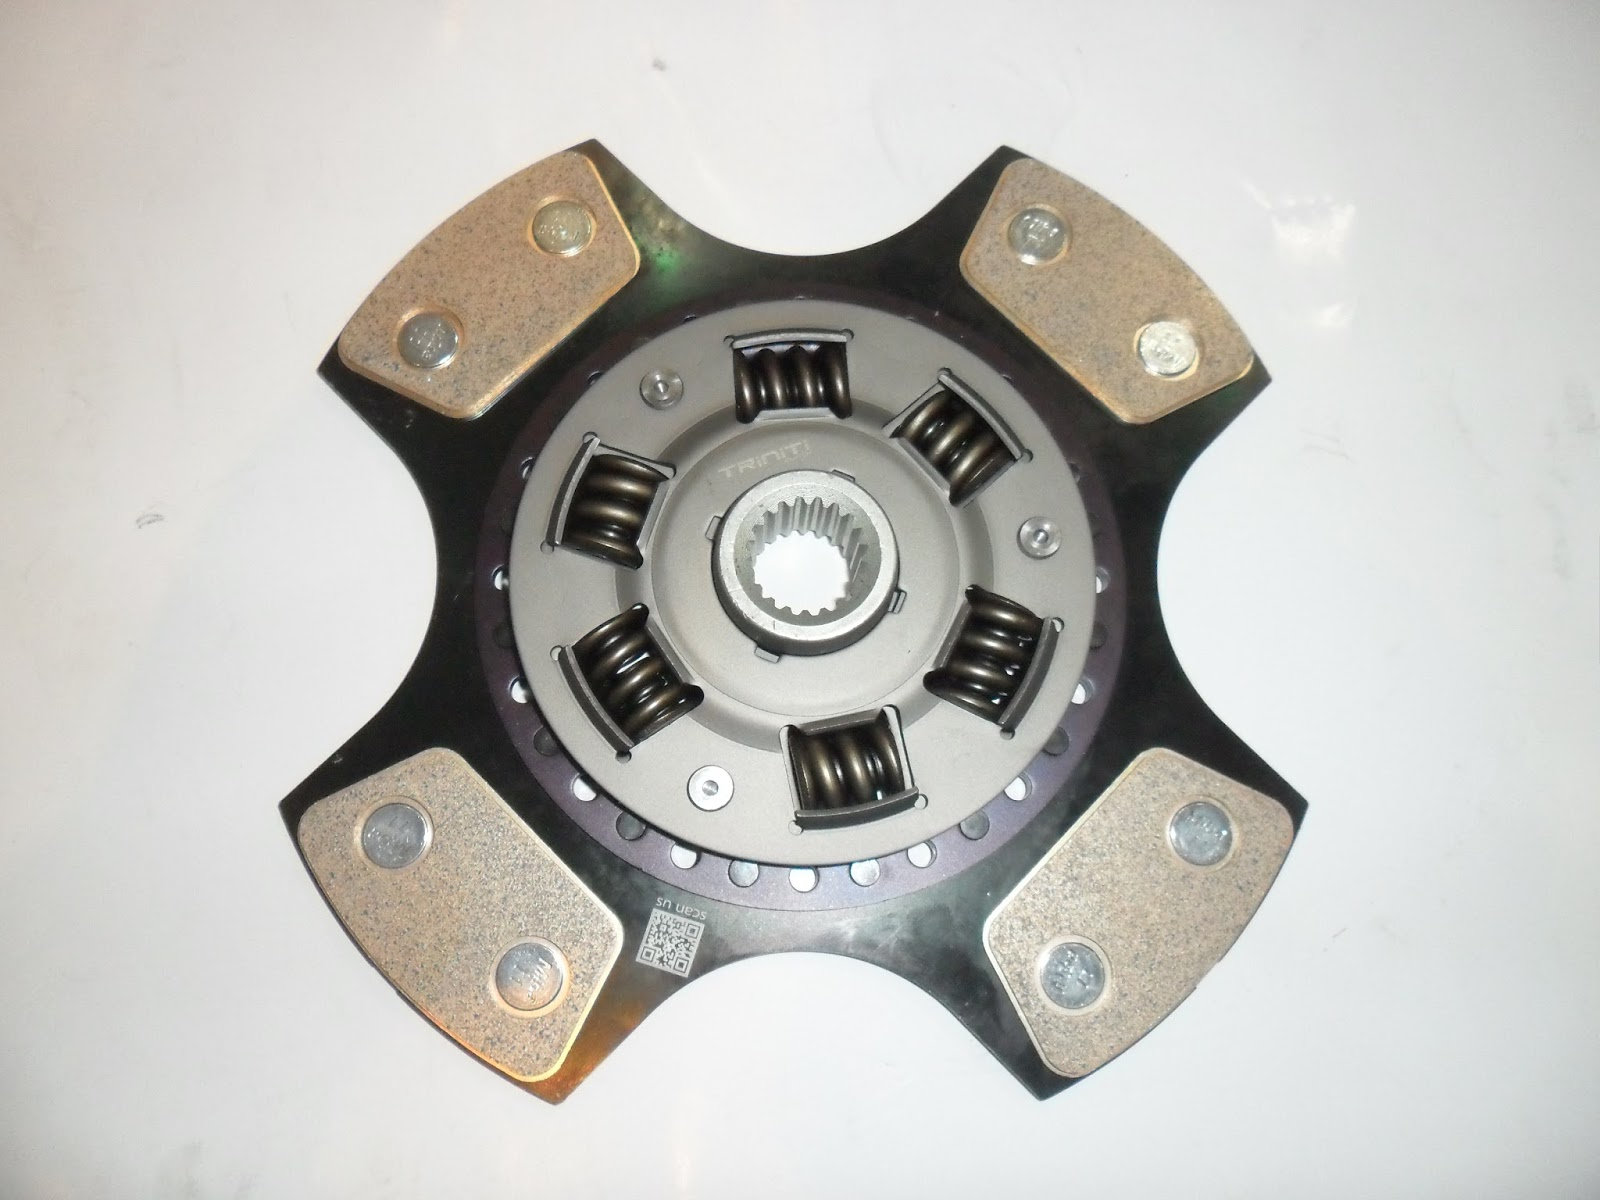 Topsound Performance  Triniti Racing Clutch 4g93 8 5 U0026quot